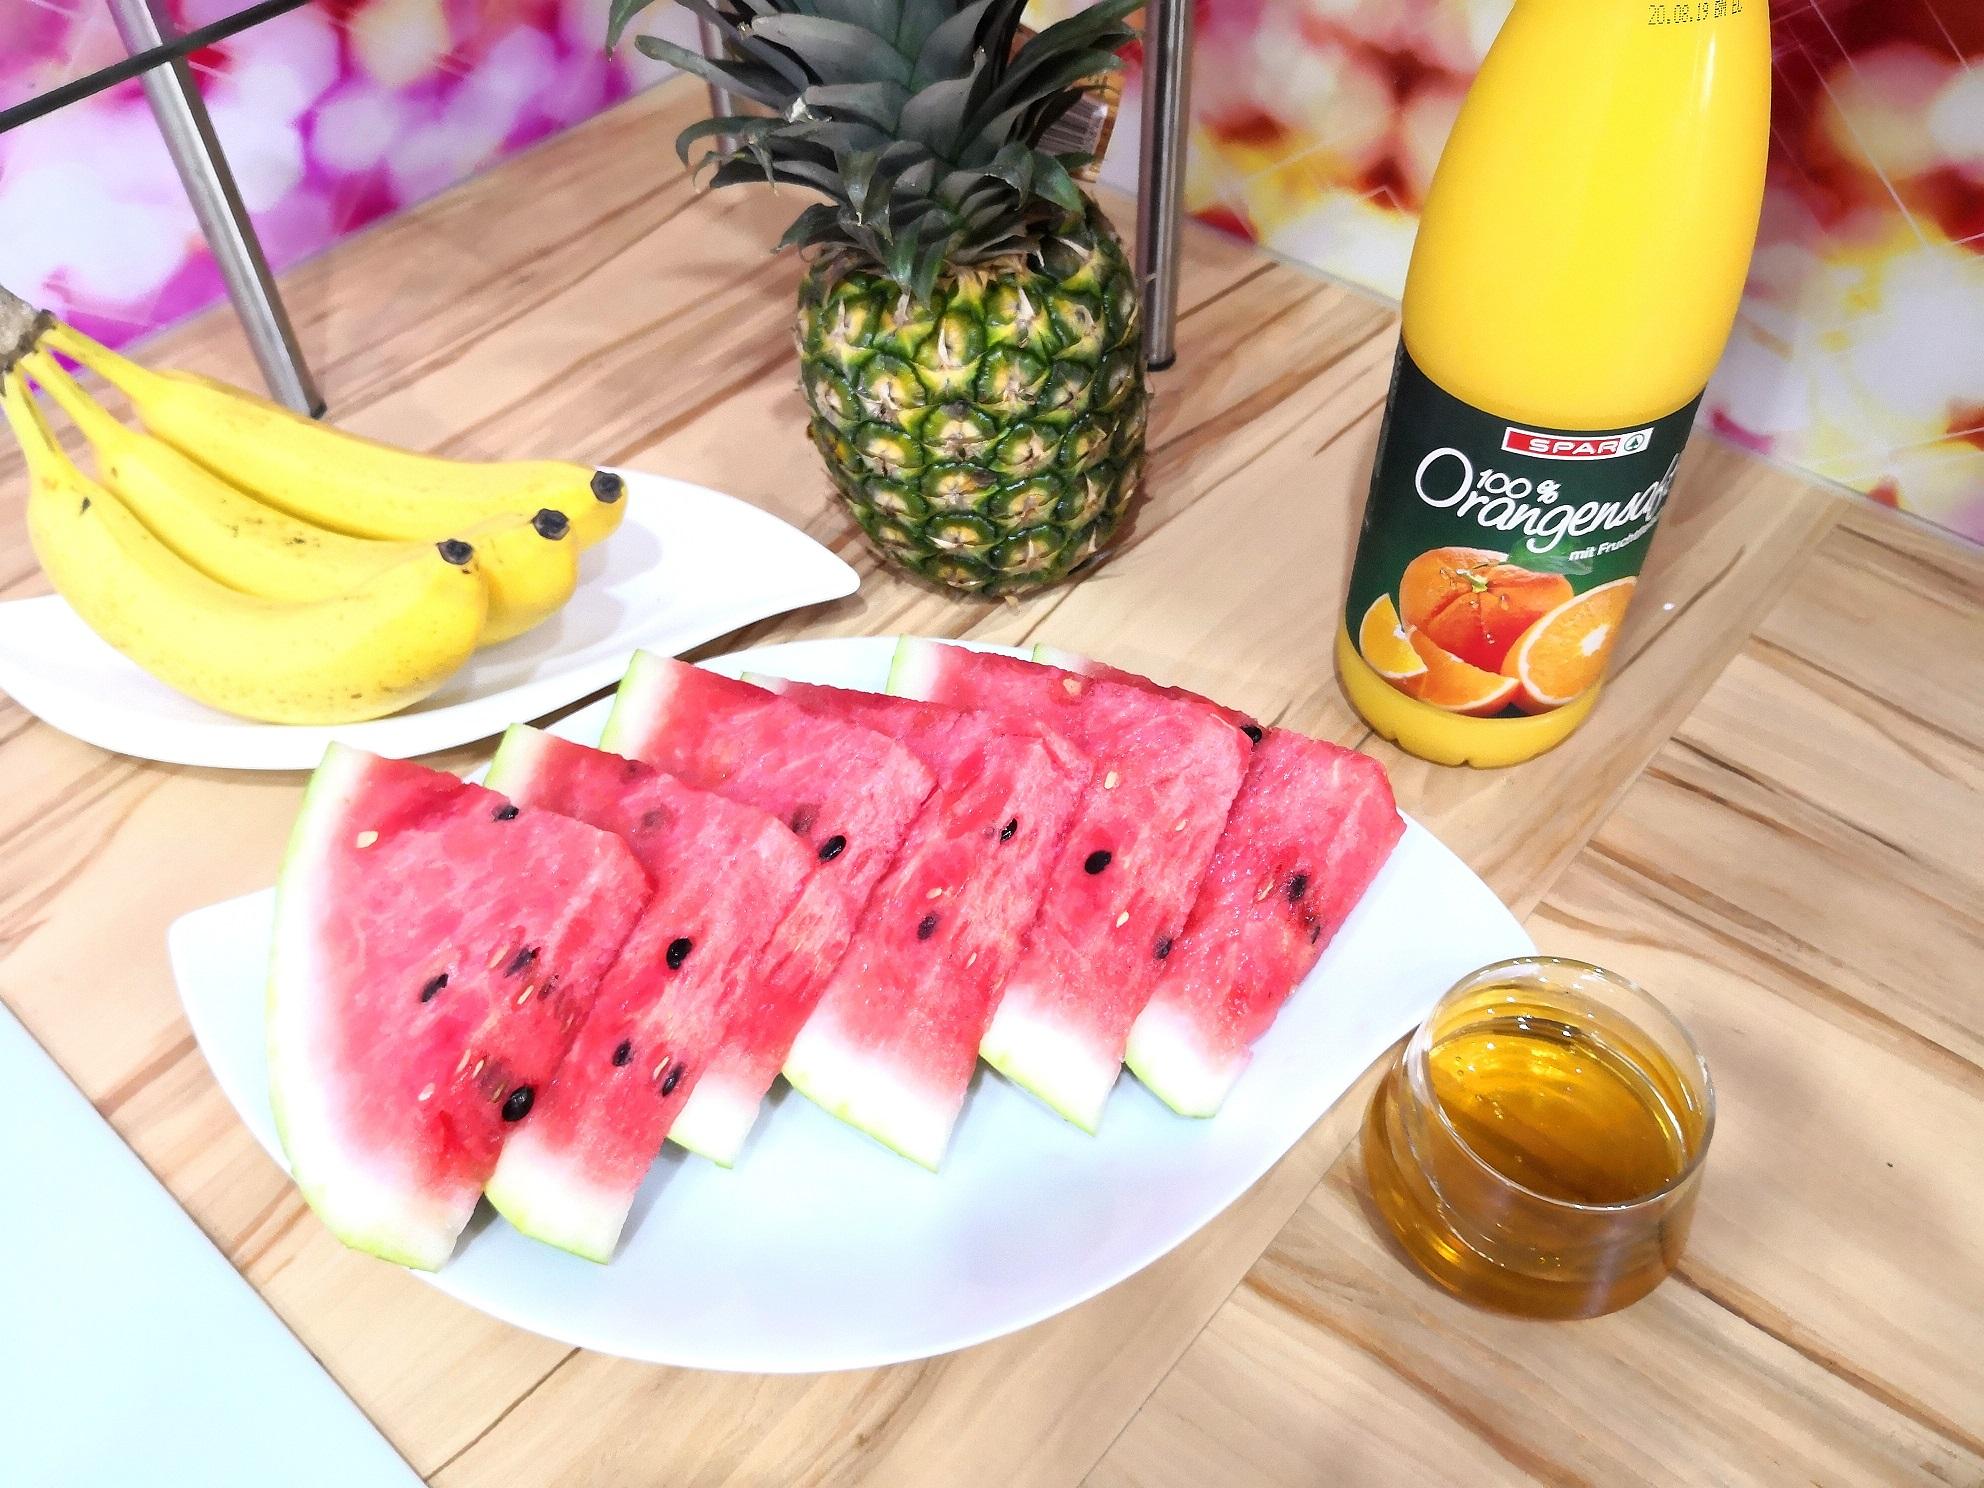 Ledeni poletni smoothie z lubenico